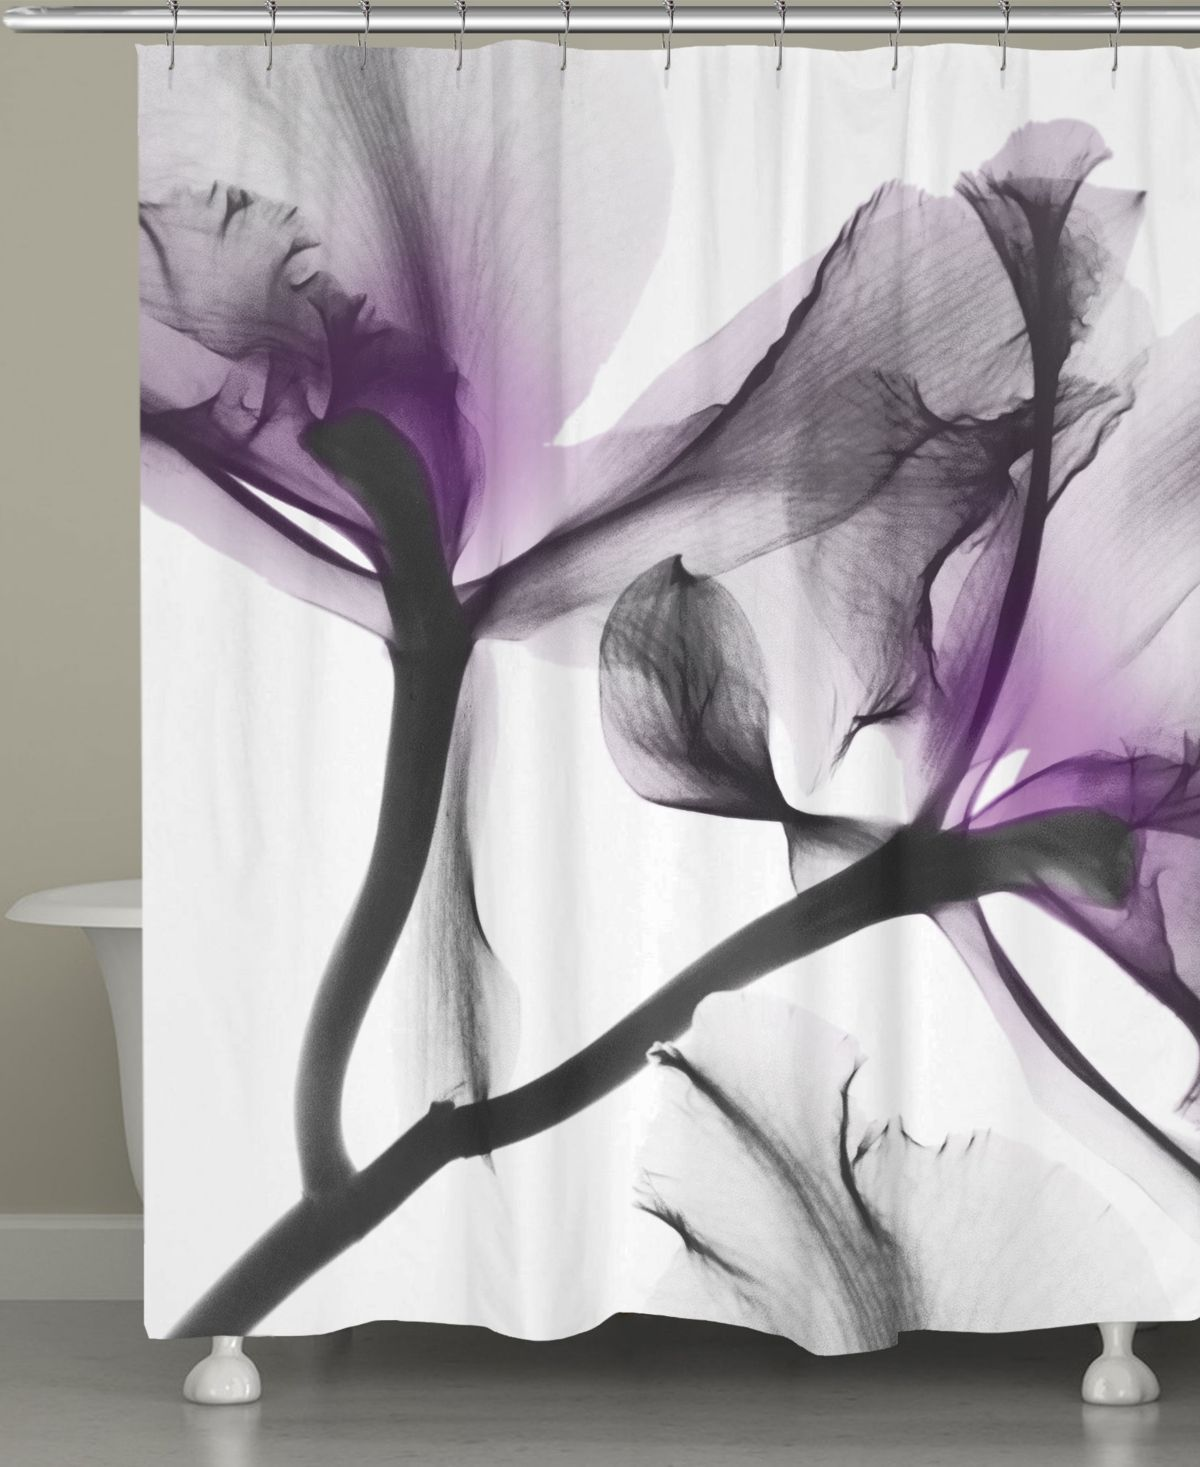 Lavendar Flwr Shower Curtain Purp Flwr Flower Shower Curtain